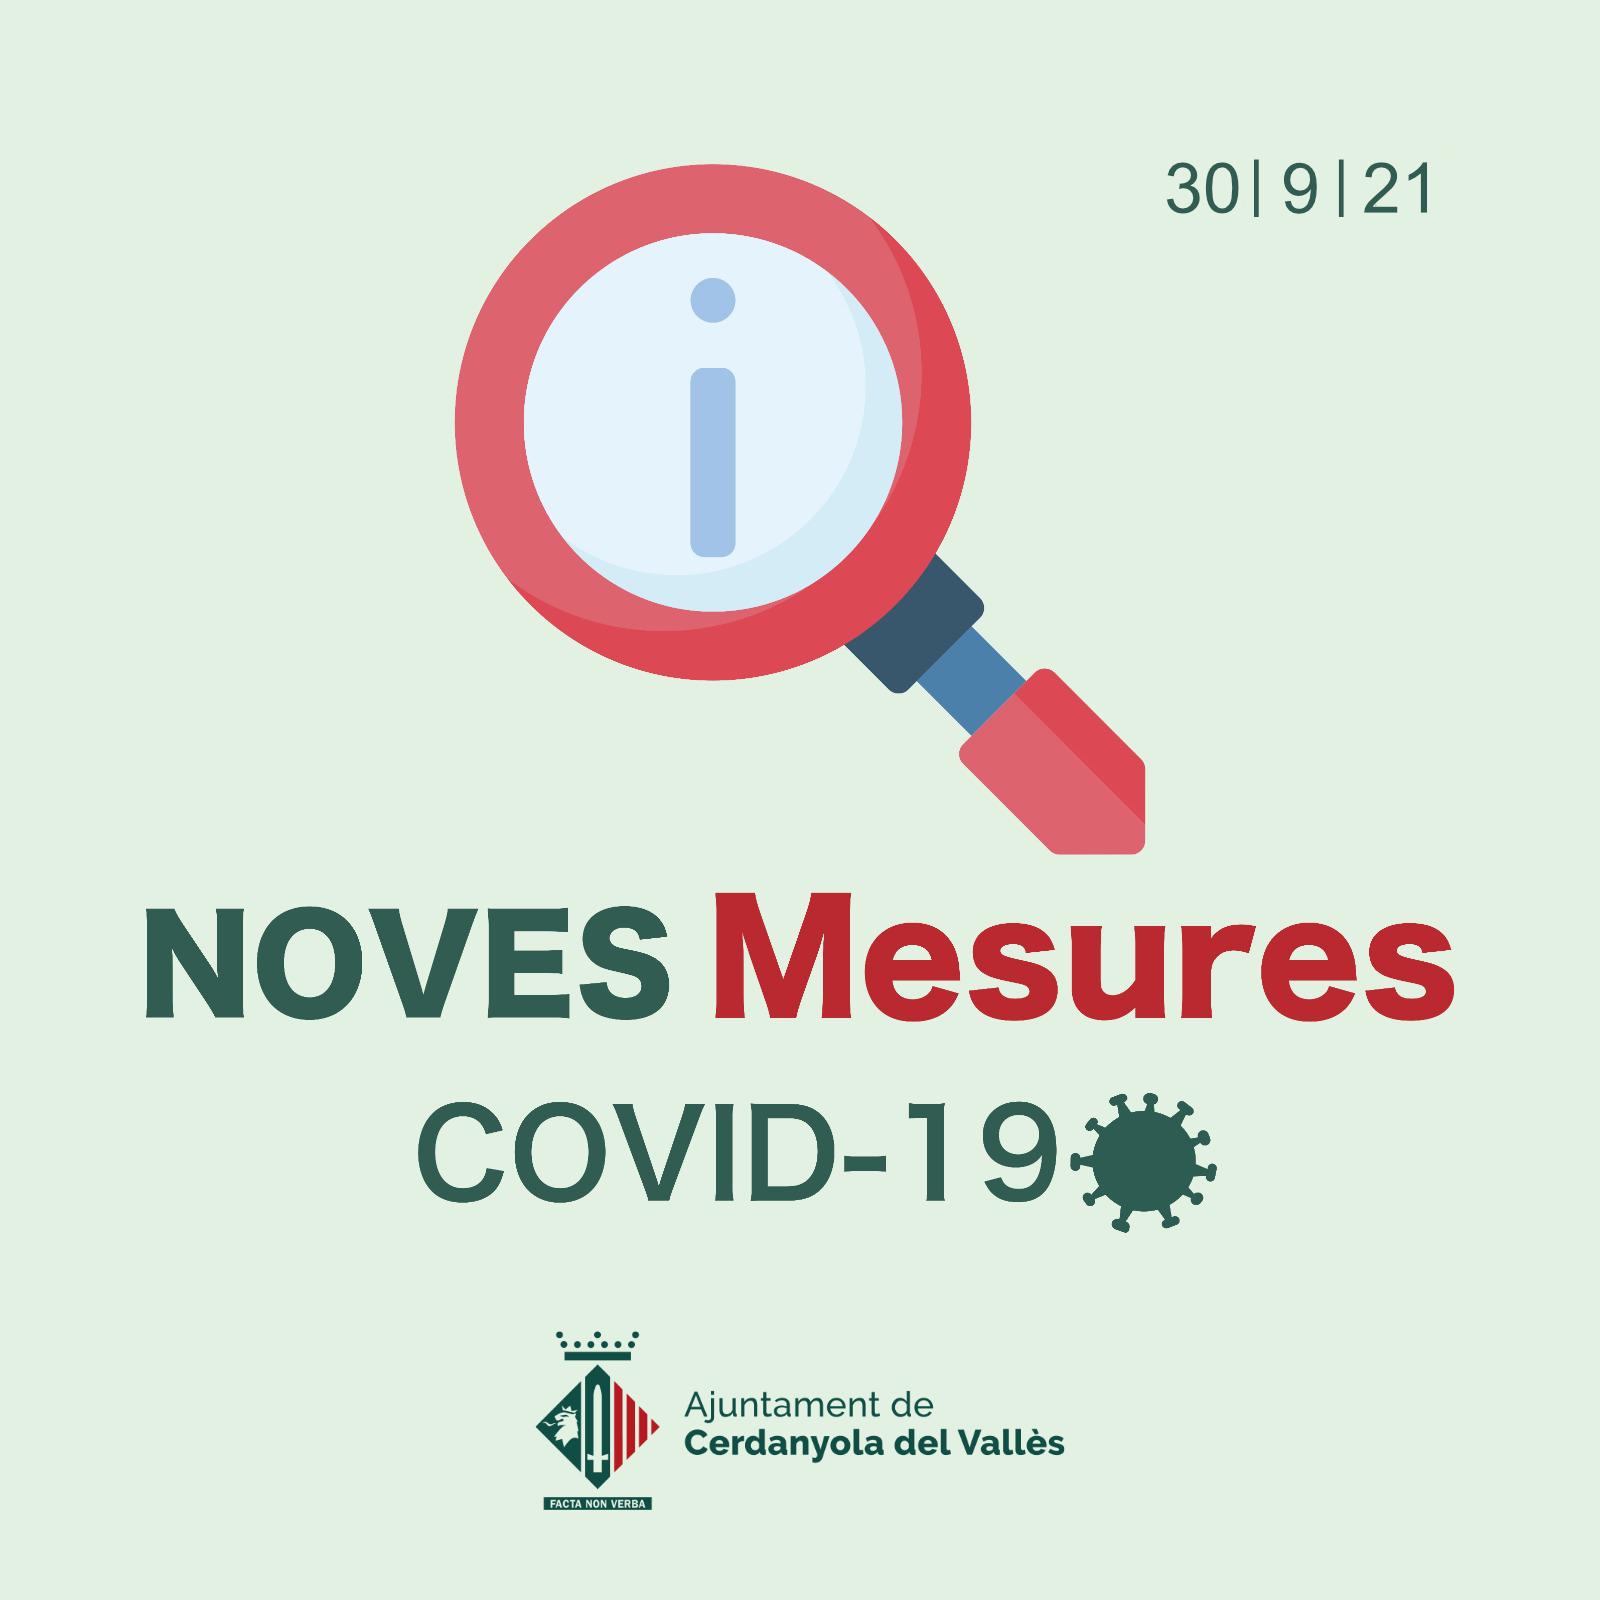 Imatge mesures COVID 30.9.21